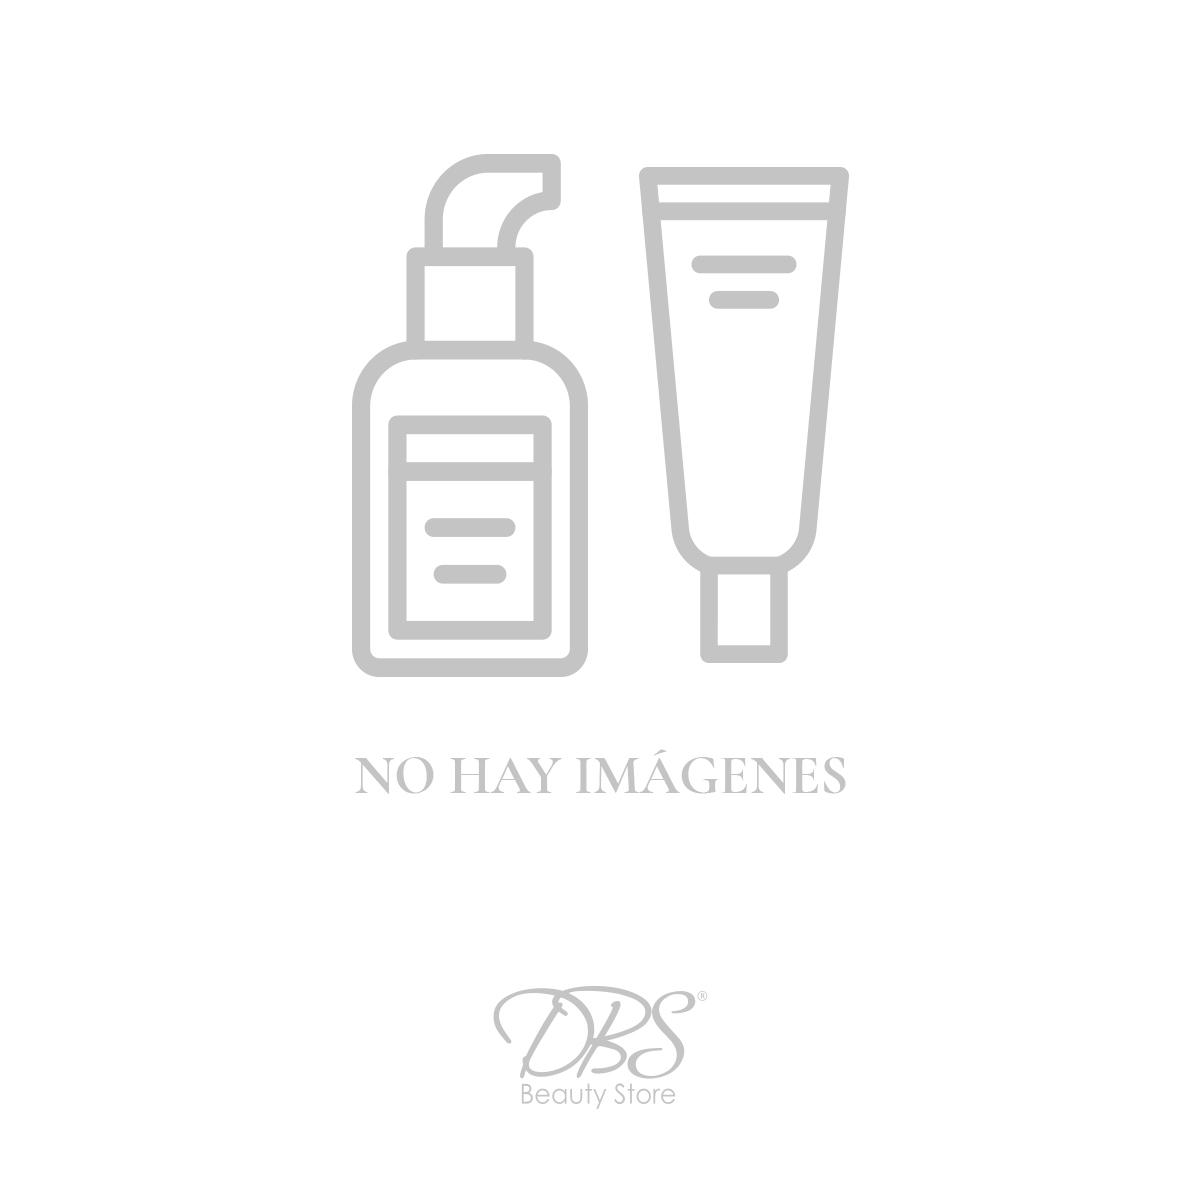 Shampoo Azul Tonalizador De Castaños Color Extend Brownlights